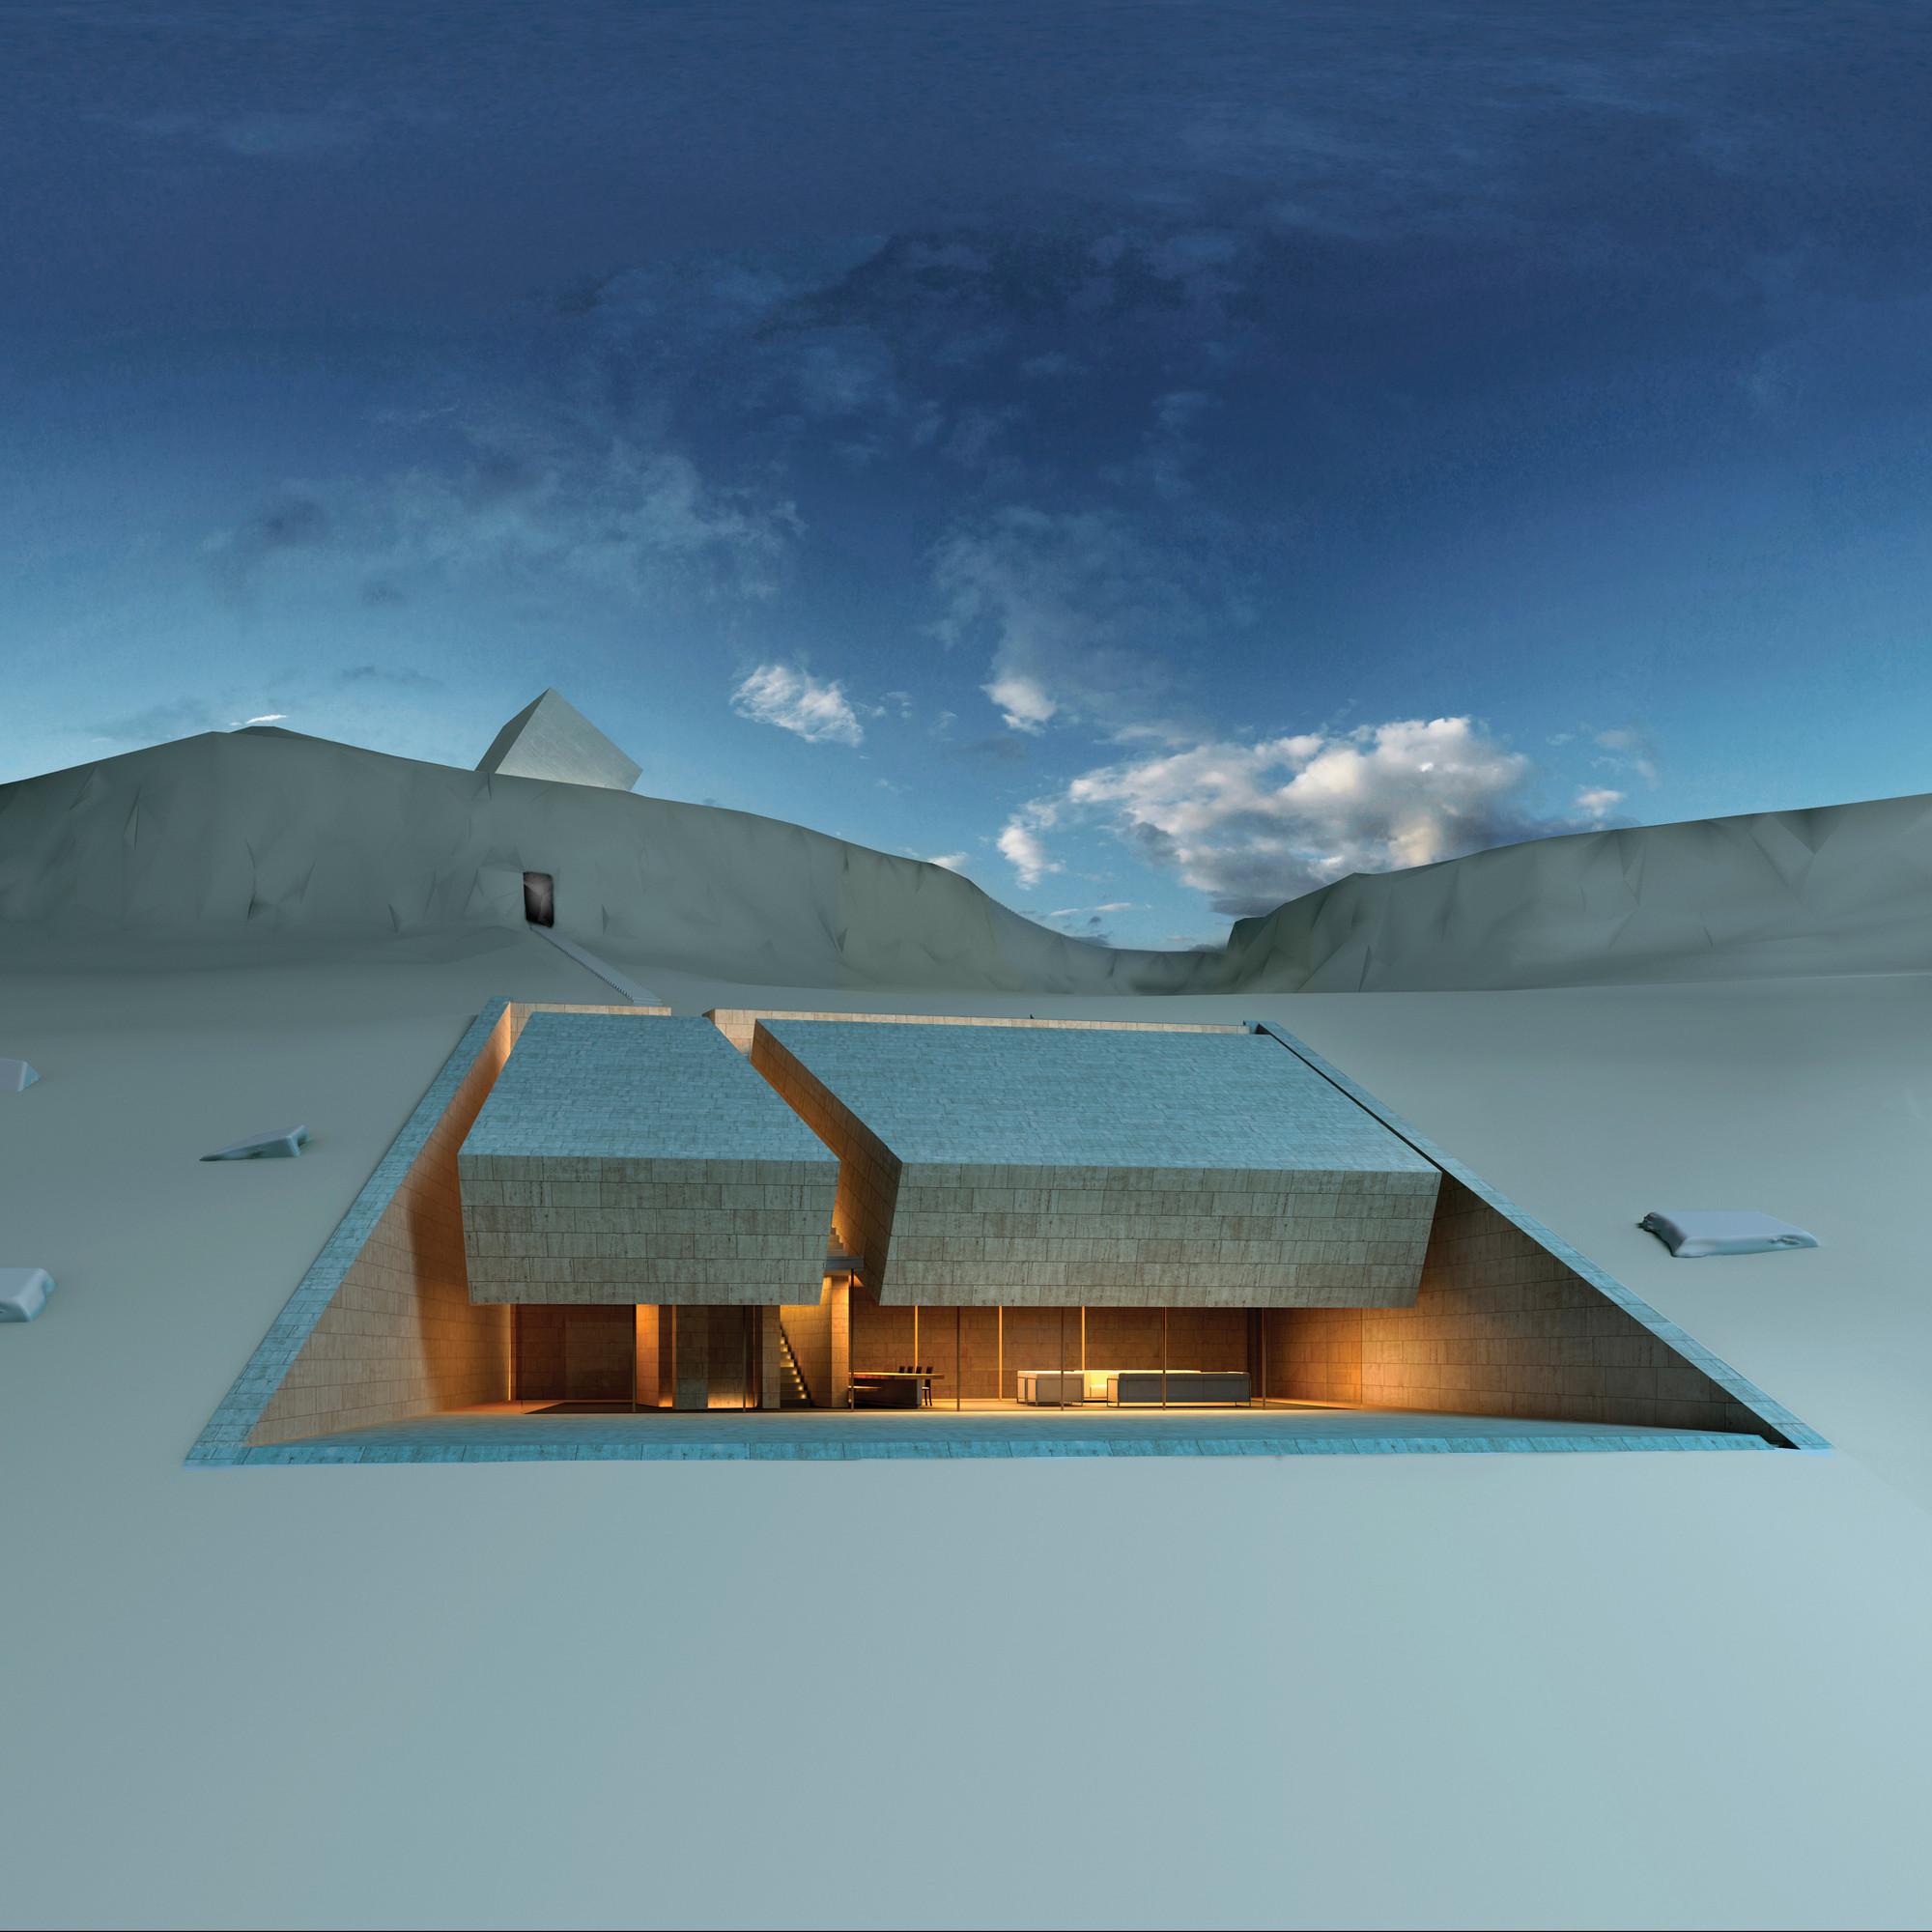 Future projects house winner: Meditation House, Lebanon by MZ Architects